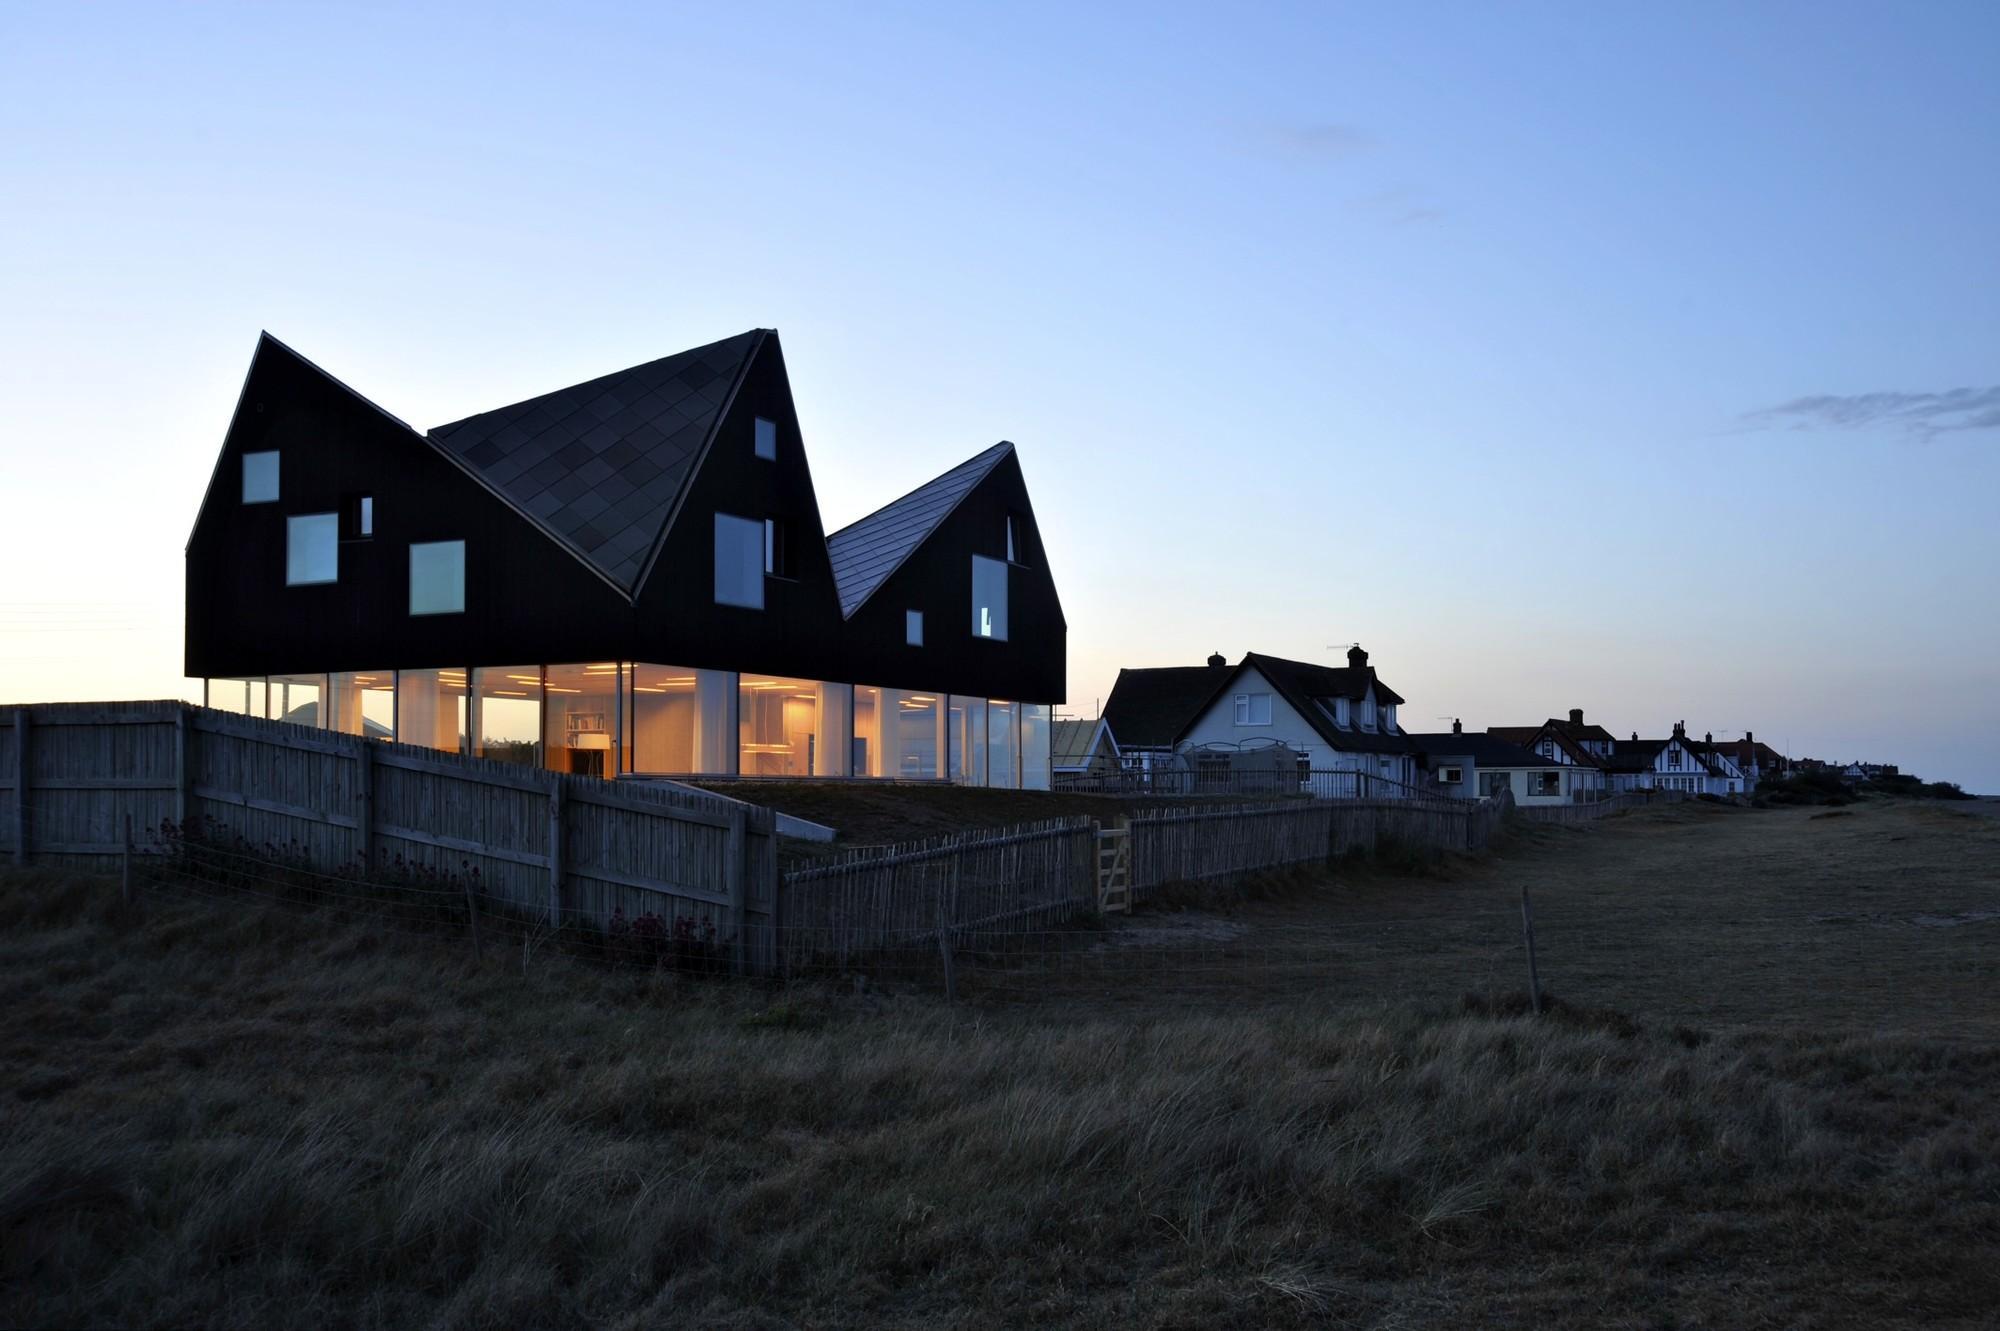 Exhibition: Jarmund / Vigsnæs Architects, Constructing Views 2011-2014, Dune House / © Nils Petter Dale